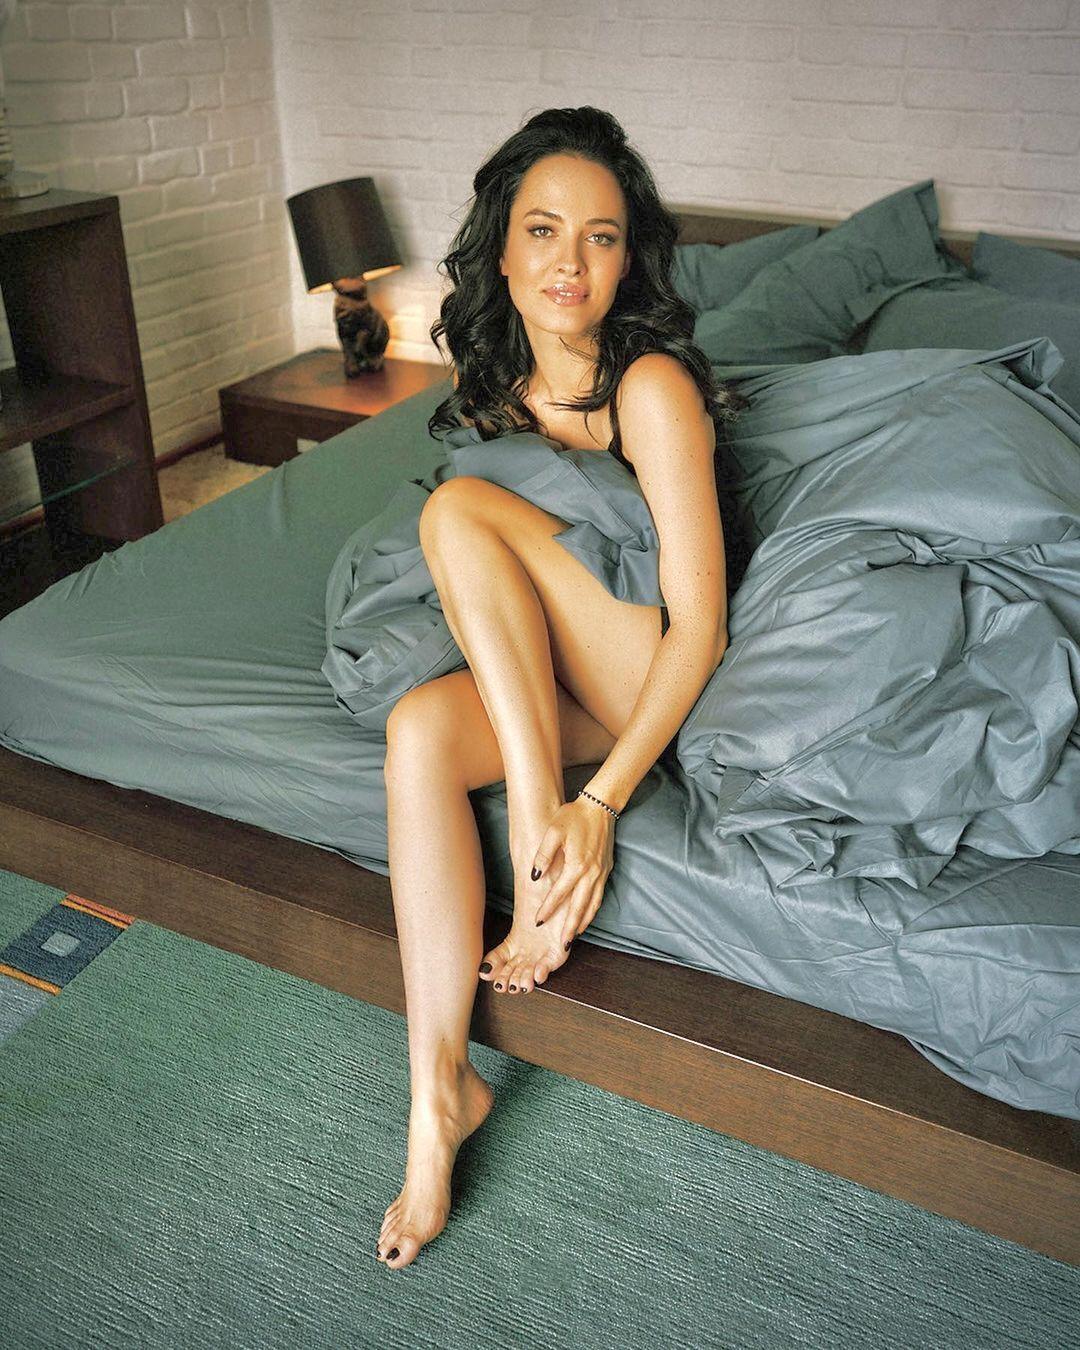 Даша Астаф'єва позує в ліжку.